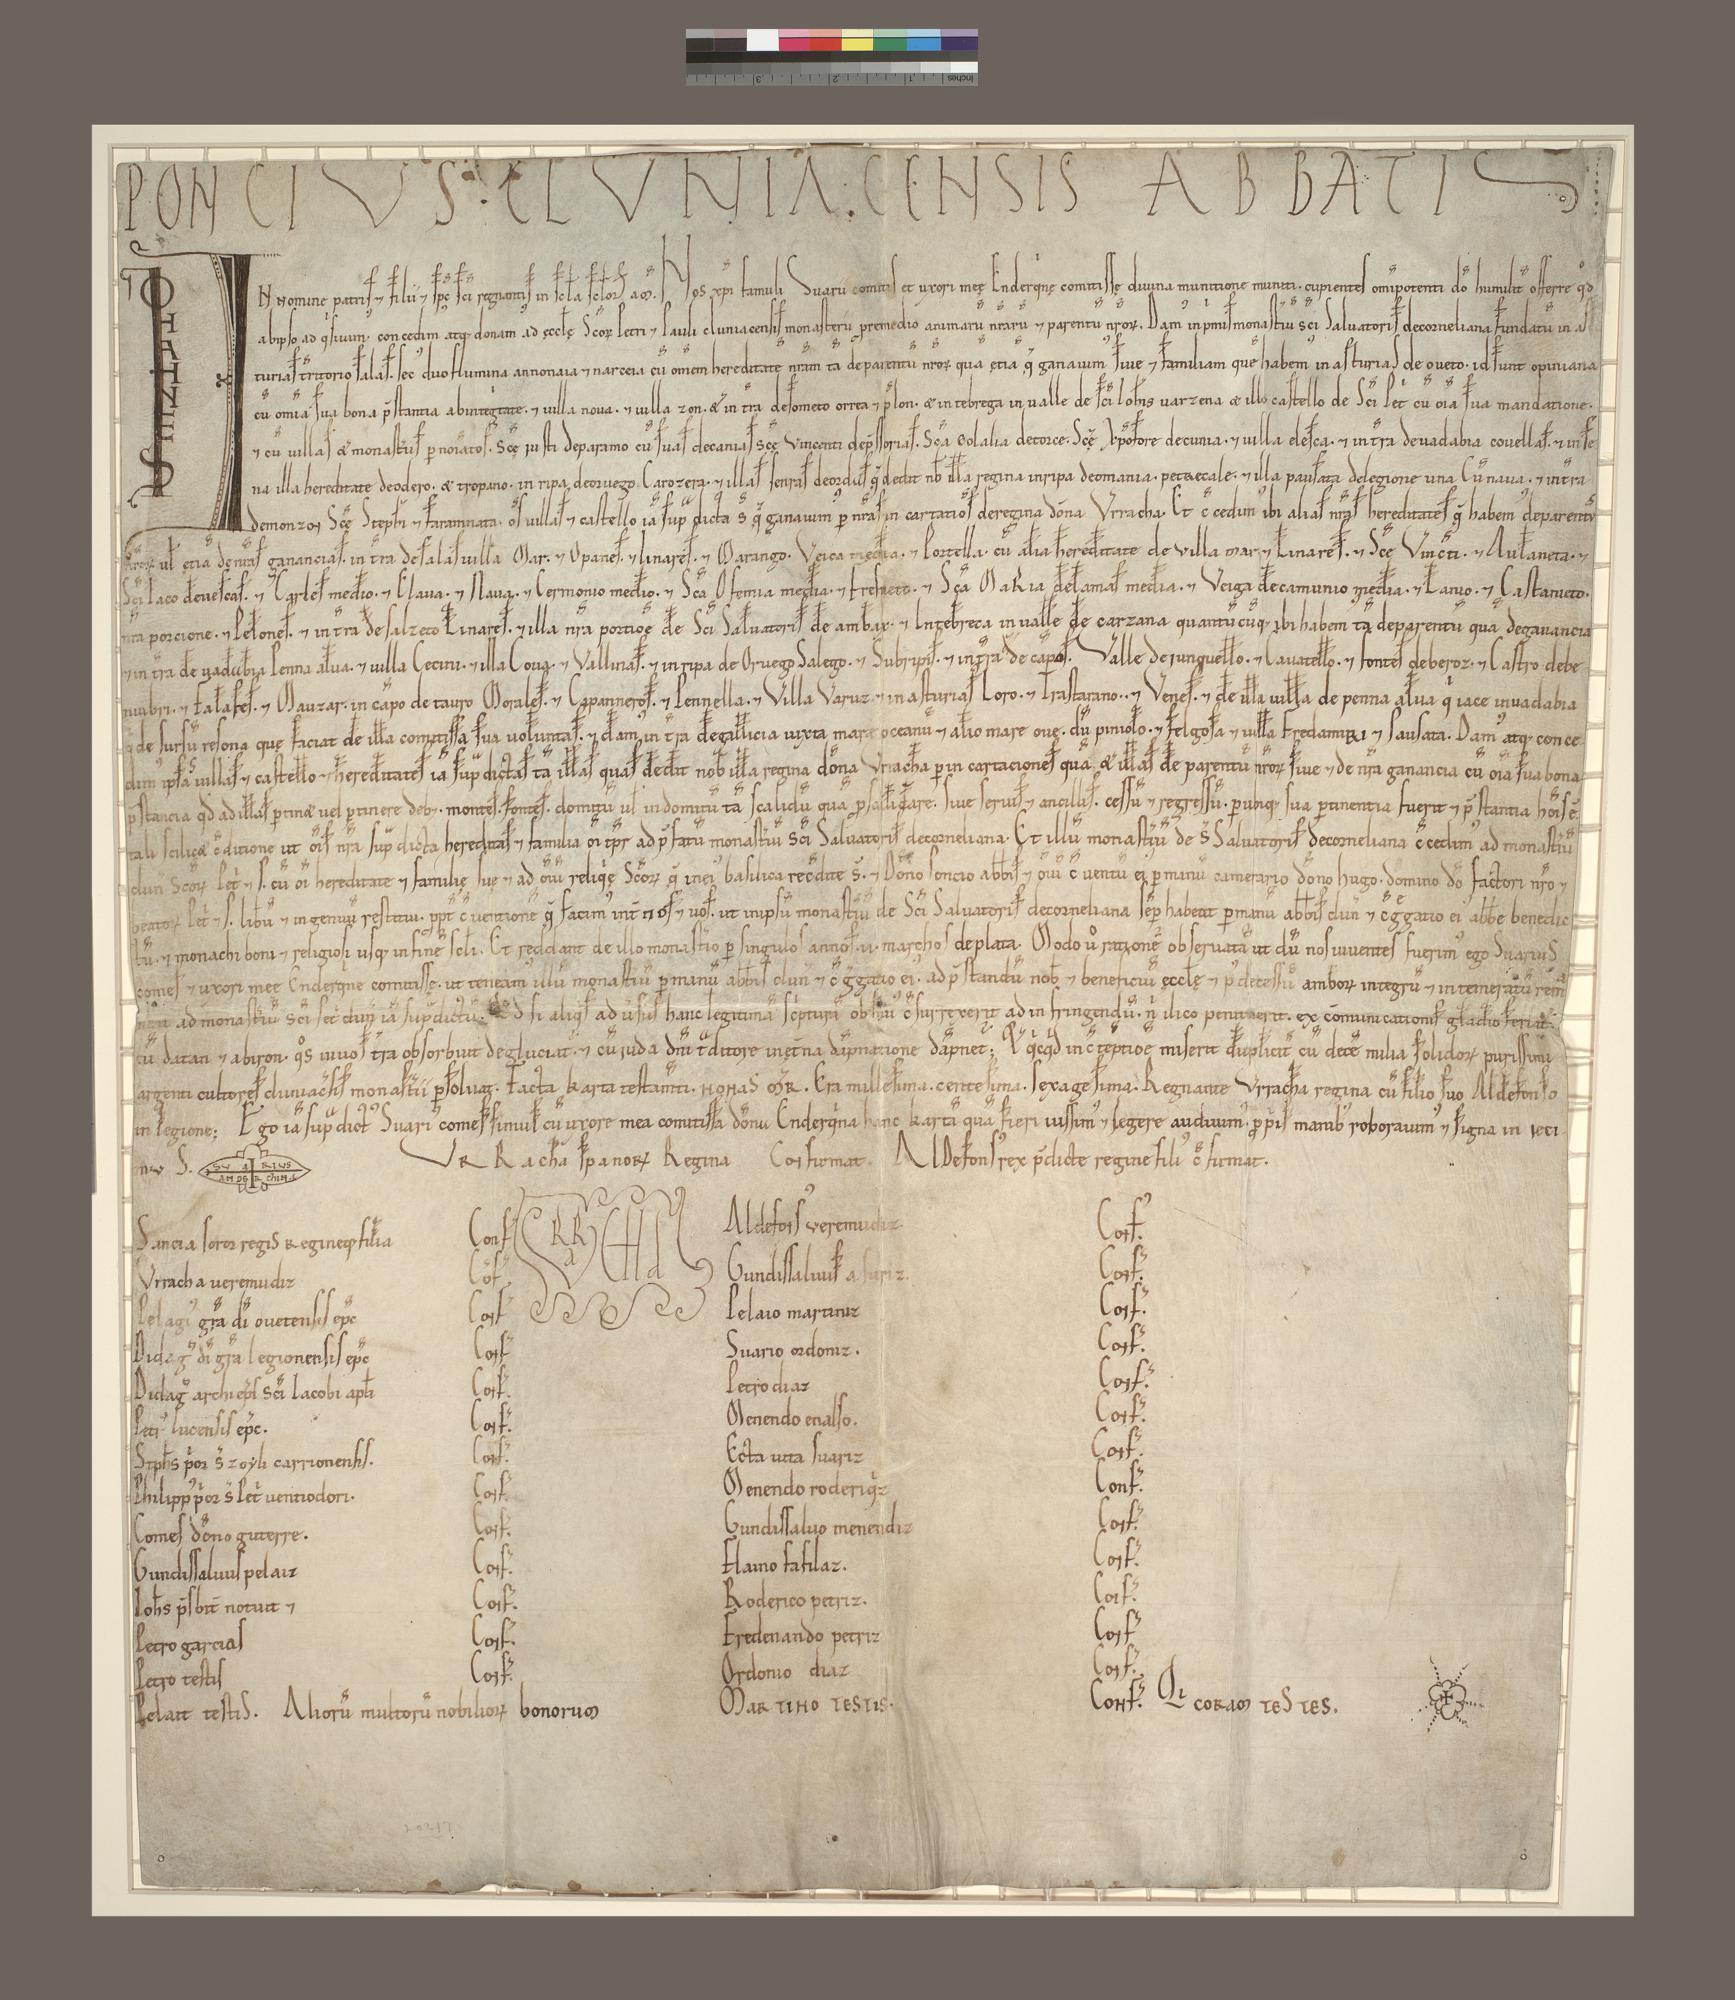 Grant of the monastery of San Salvador de Cornellana to Cluny